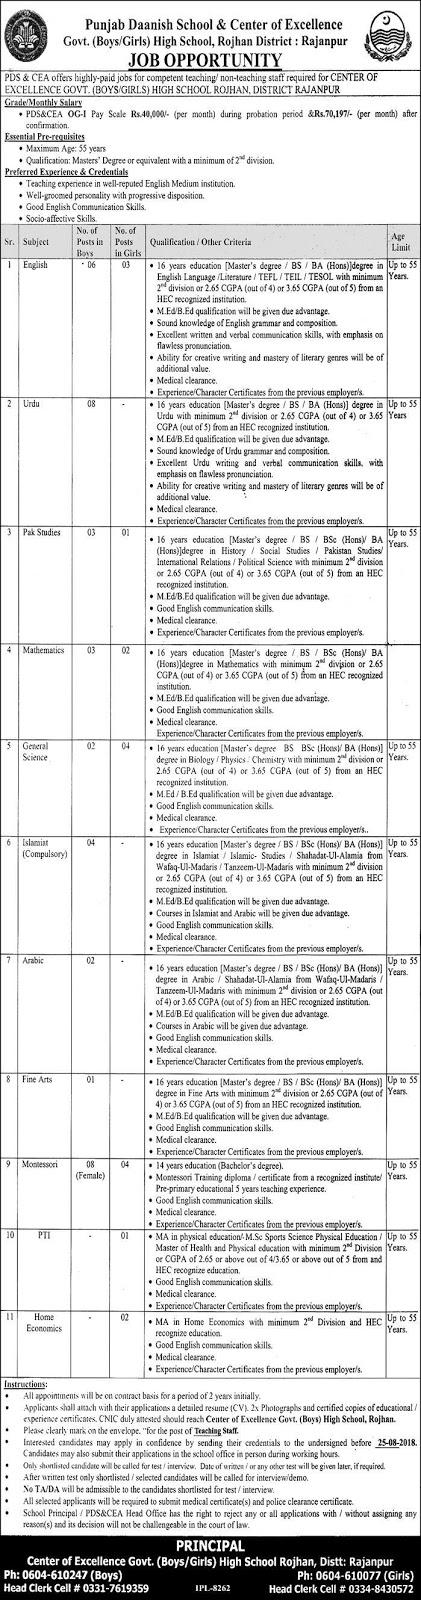 Daanish School Punjab Jobs for Teachers 2018